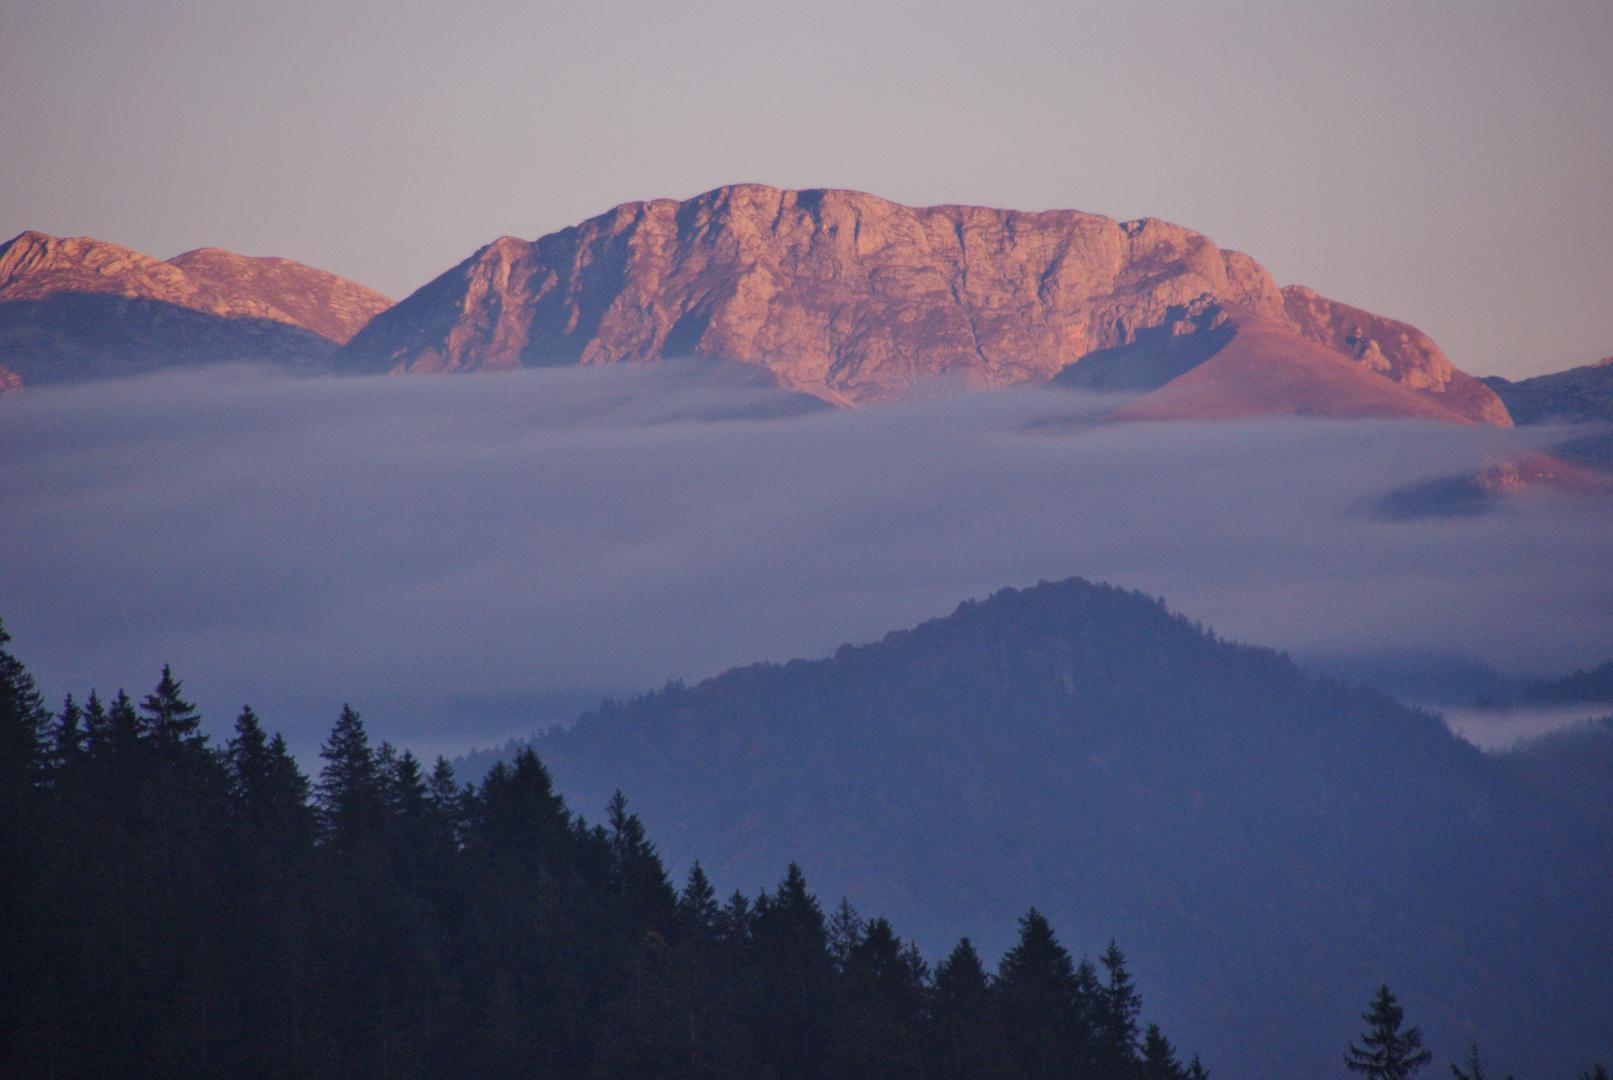 Sonnenaufgang in Berchtesgaden